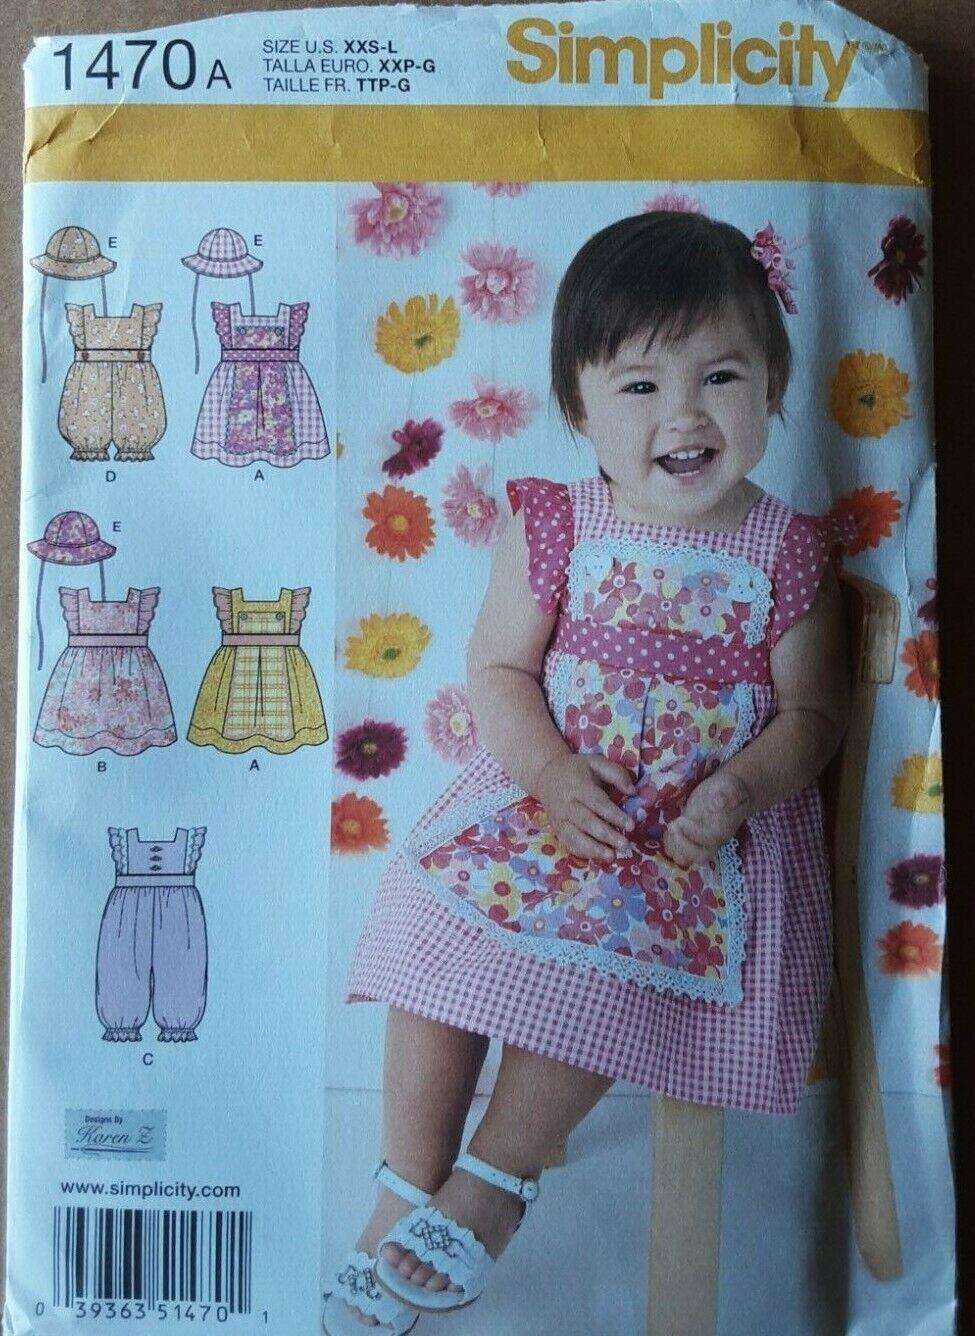 SIMPLICITY 1470A SIZE XXS-L INFANTS DRESS-ROMPER IN 2 LENGTHS - $6.99